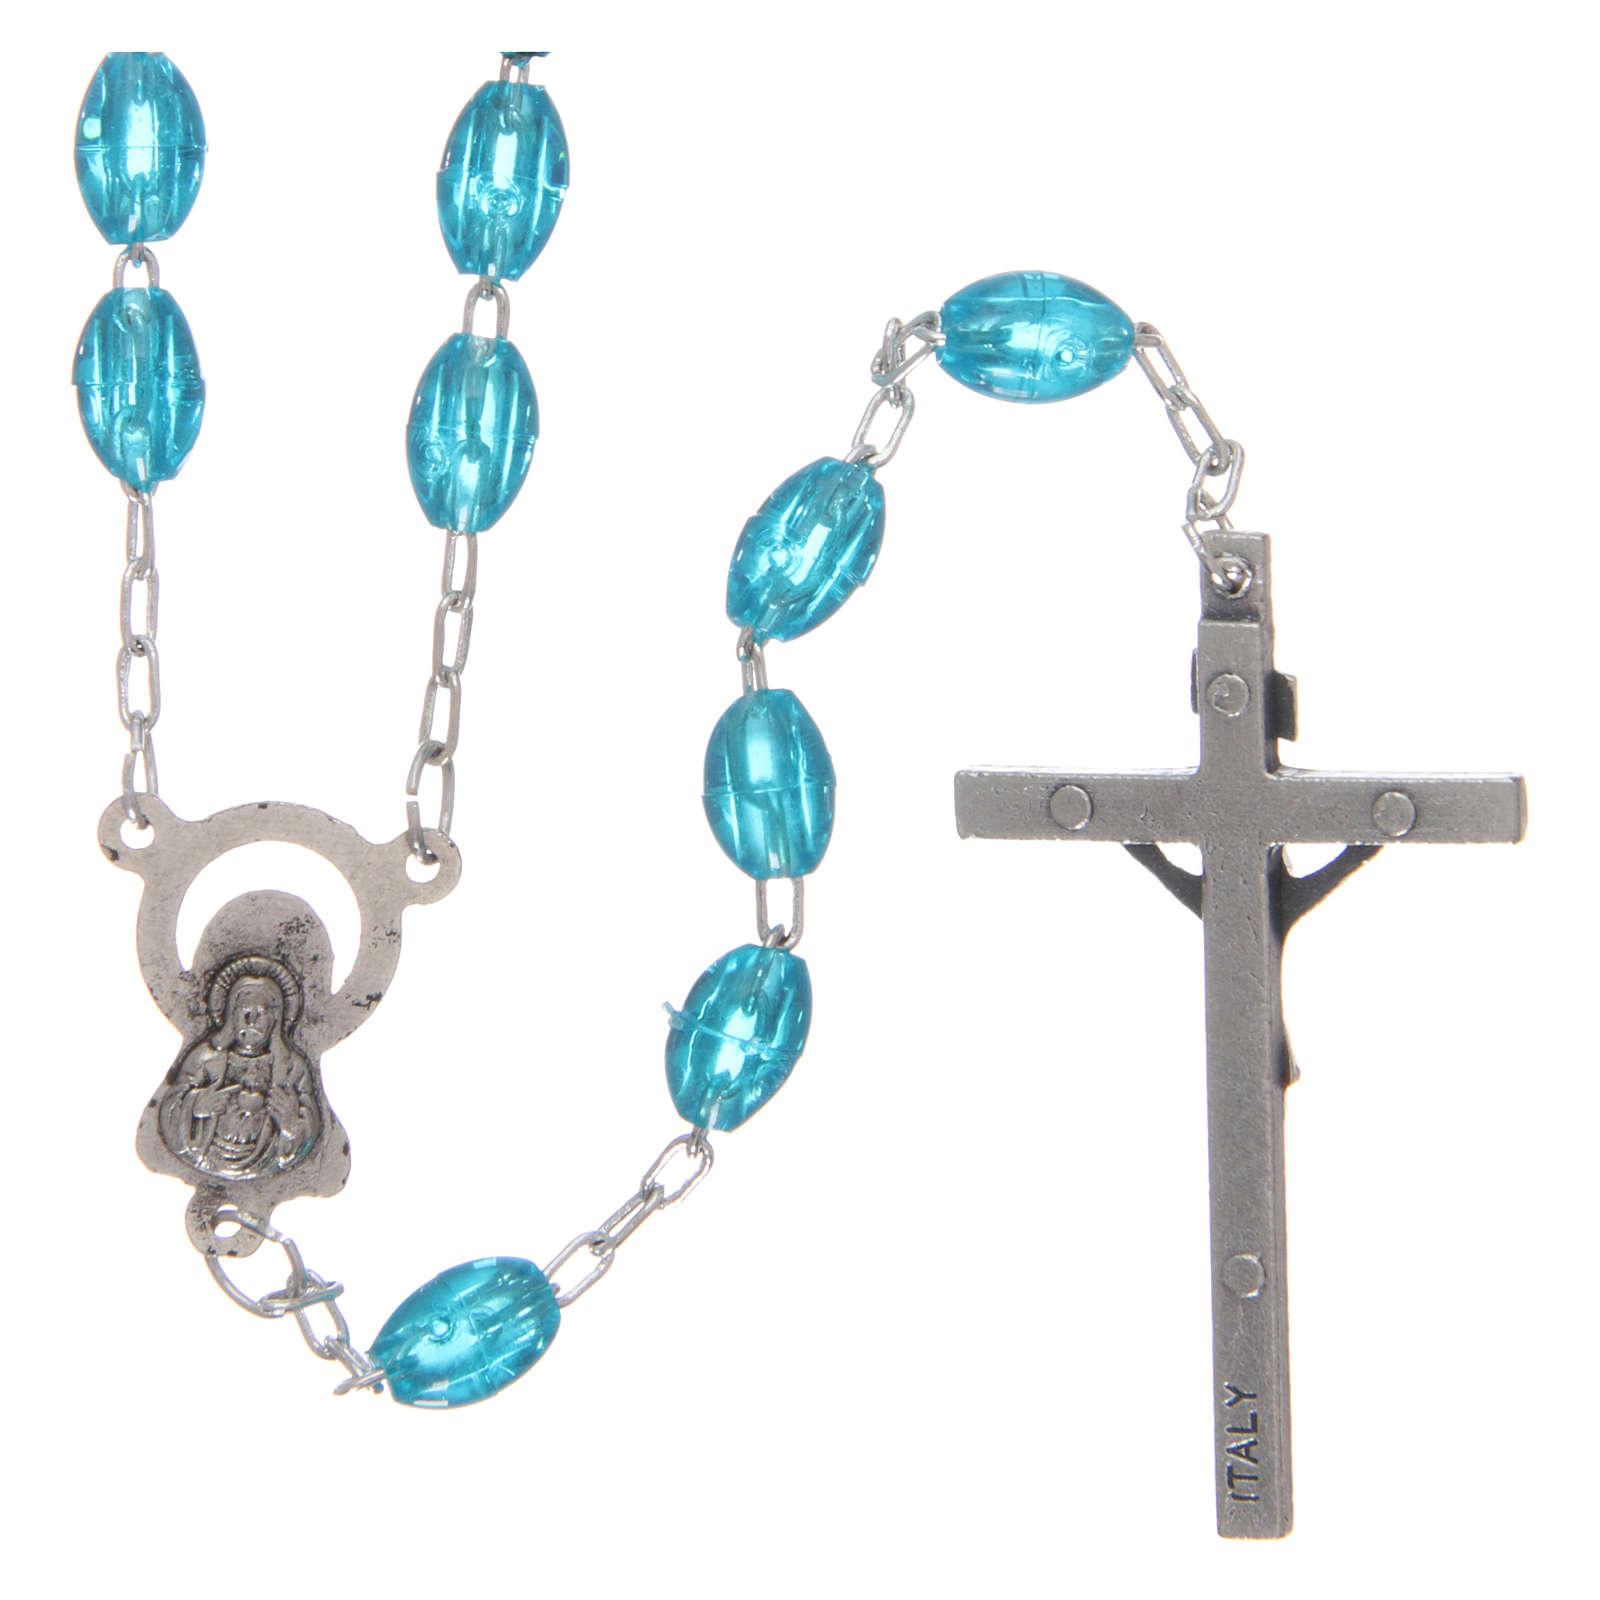 Rosary in plastic 6x5 mm grains, aqua 4